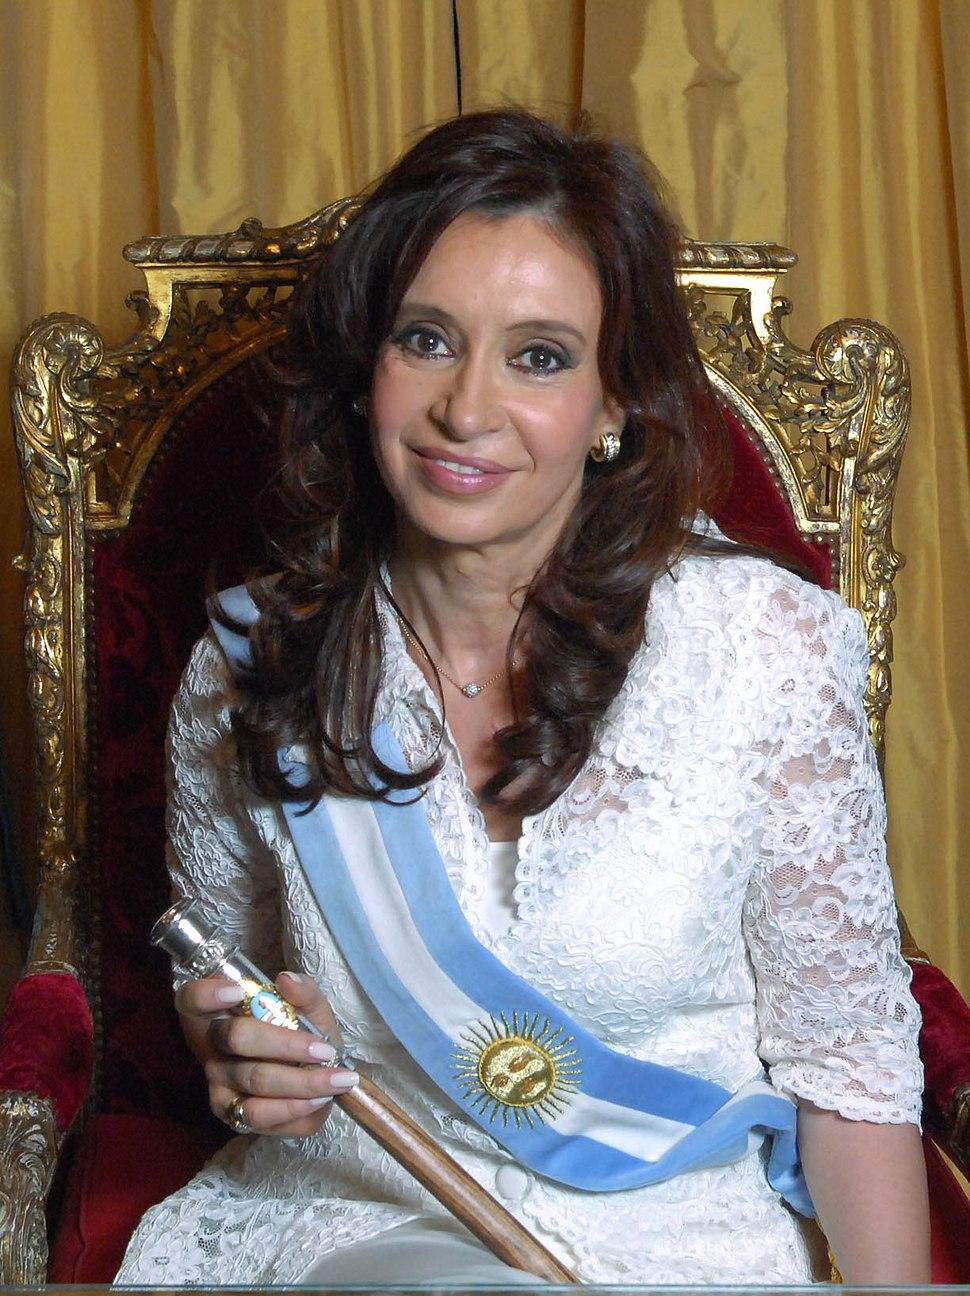 Cristina Fernandez de Kirchner - Foto Oficial 2